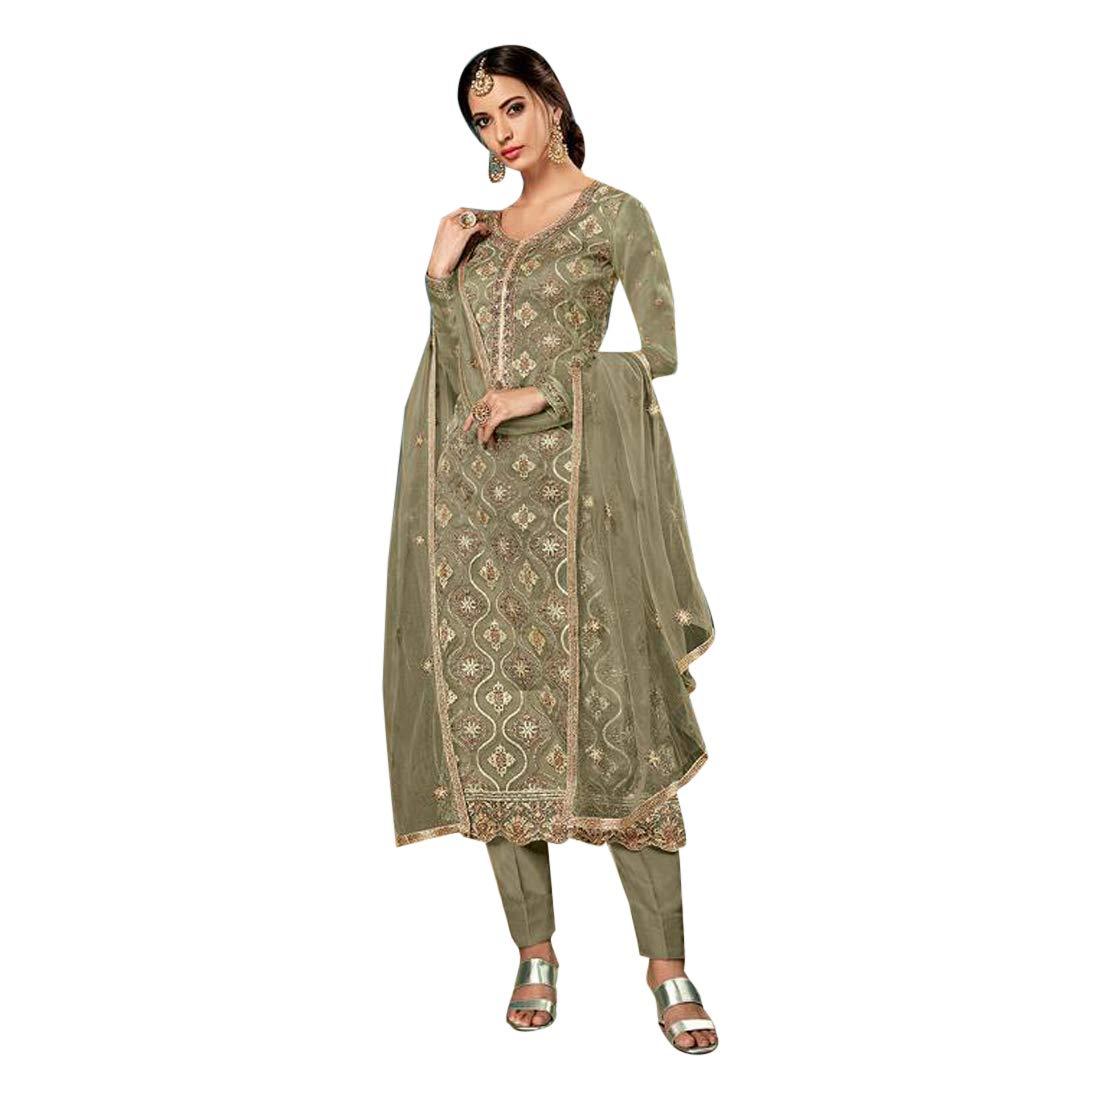 Khaki Designer Silk Embroidered Salwar Kameez suit for Women Indian Muslim Party wear 7525